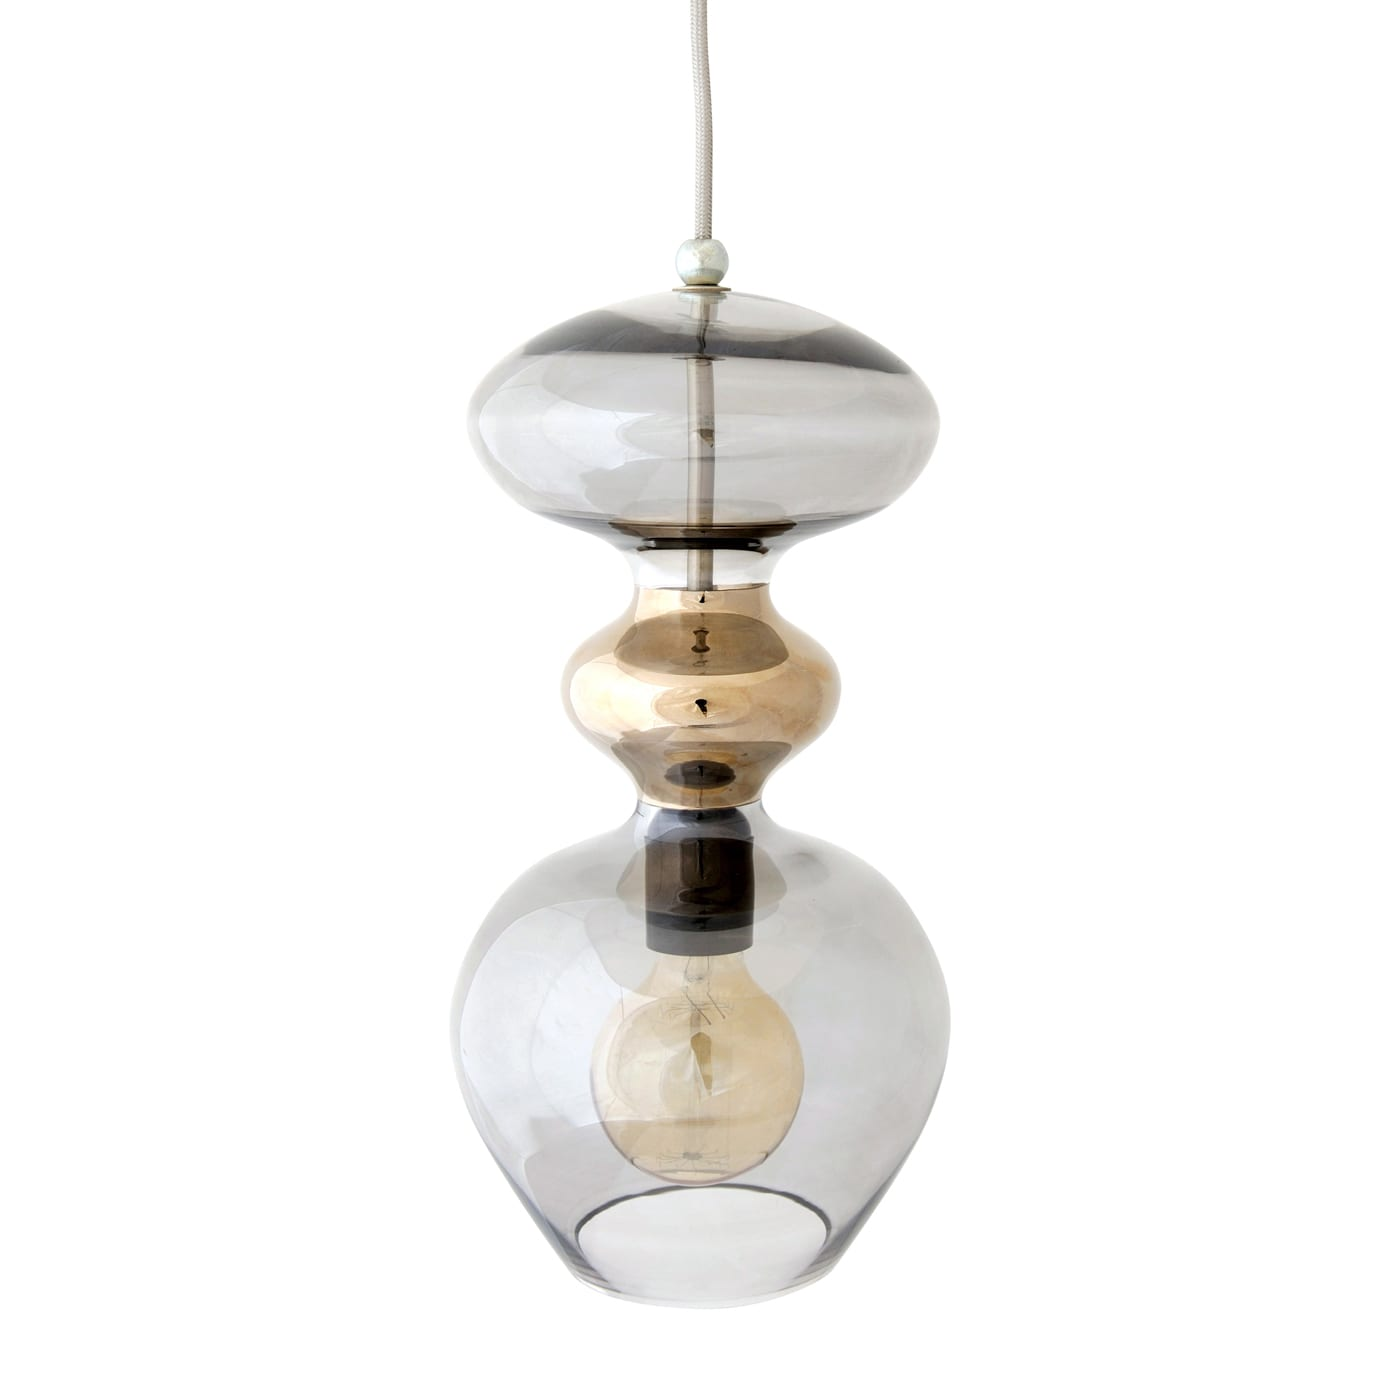 Futura Pendant Lamp, Chestnut Brown, 37cmH